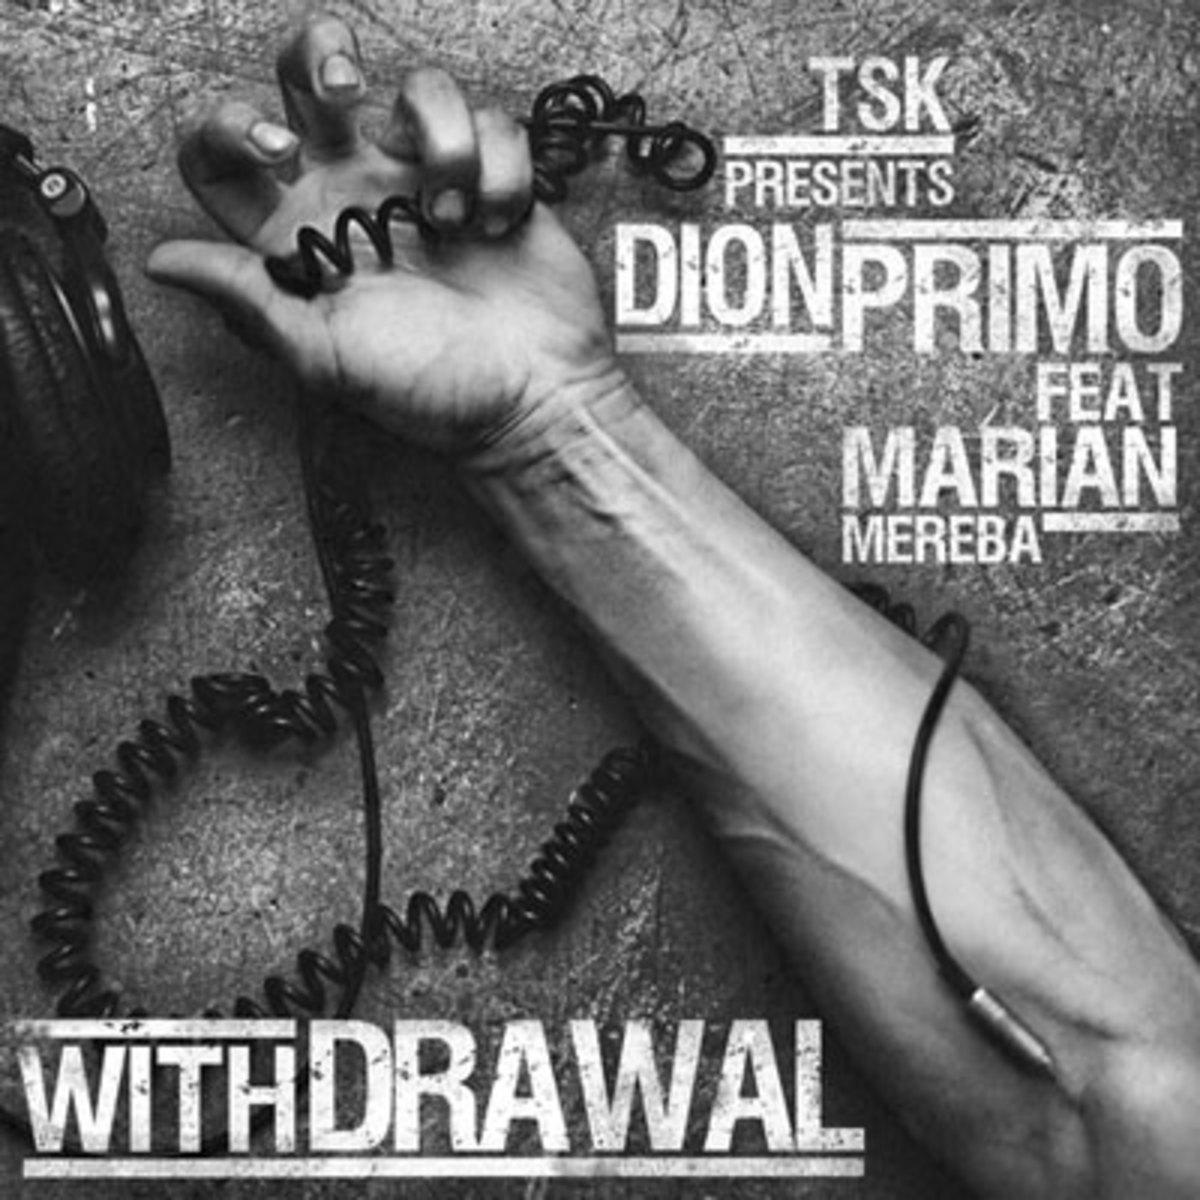 dionprimo-withdrawl.jpg